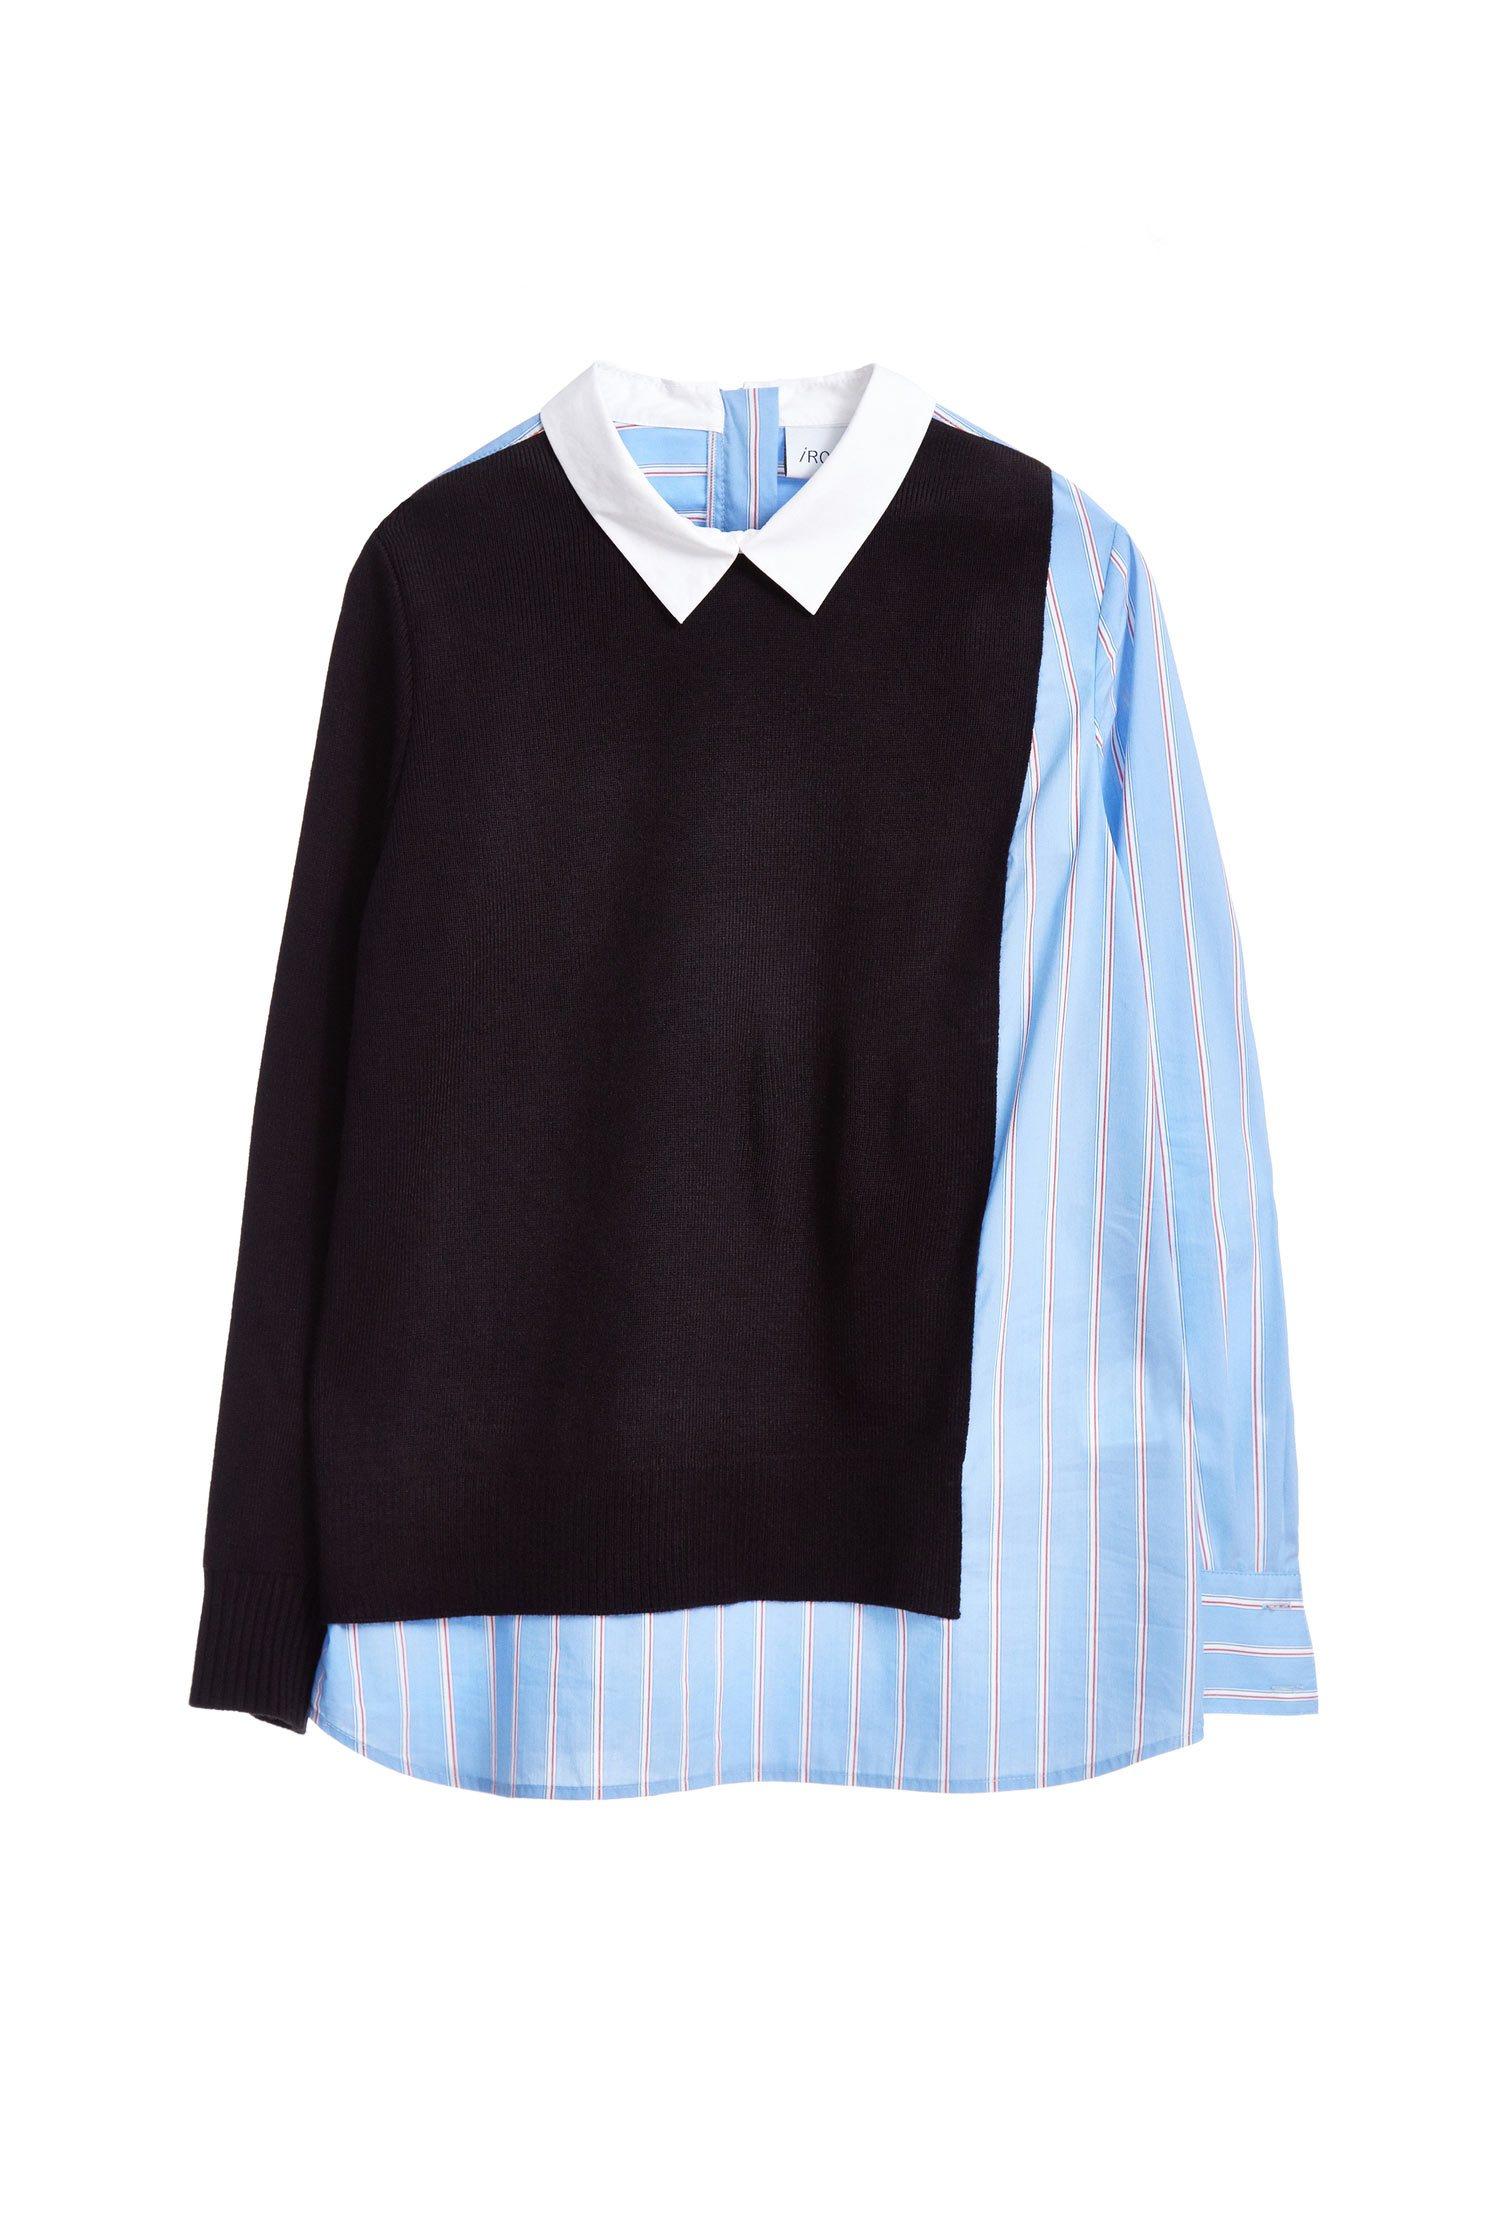 simple straight stripes fashion blouse